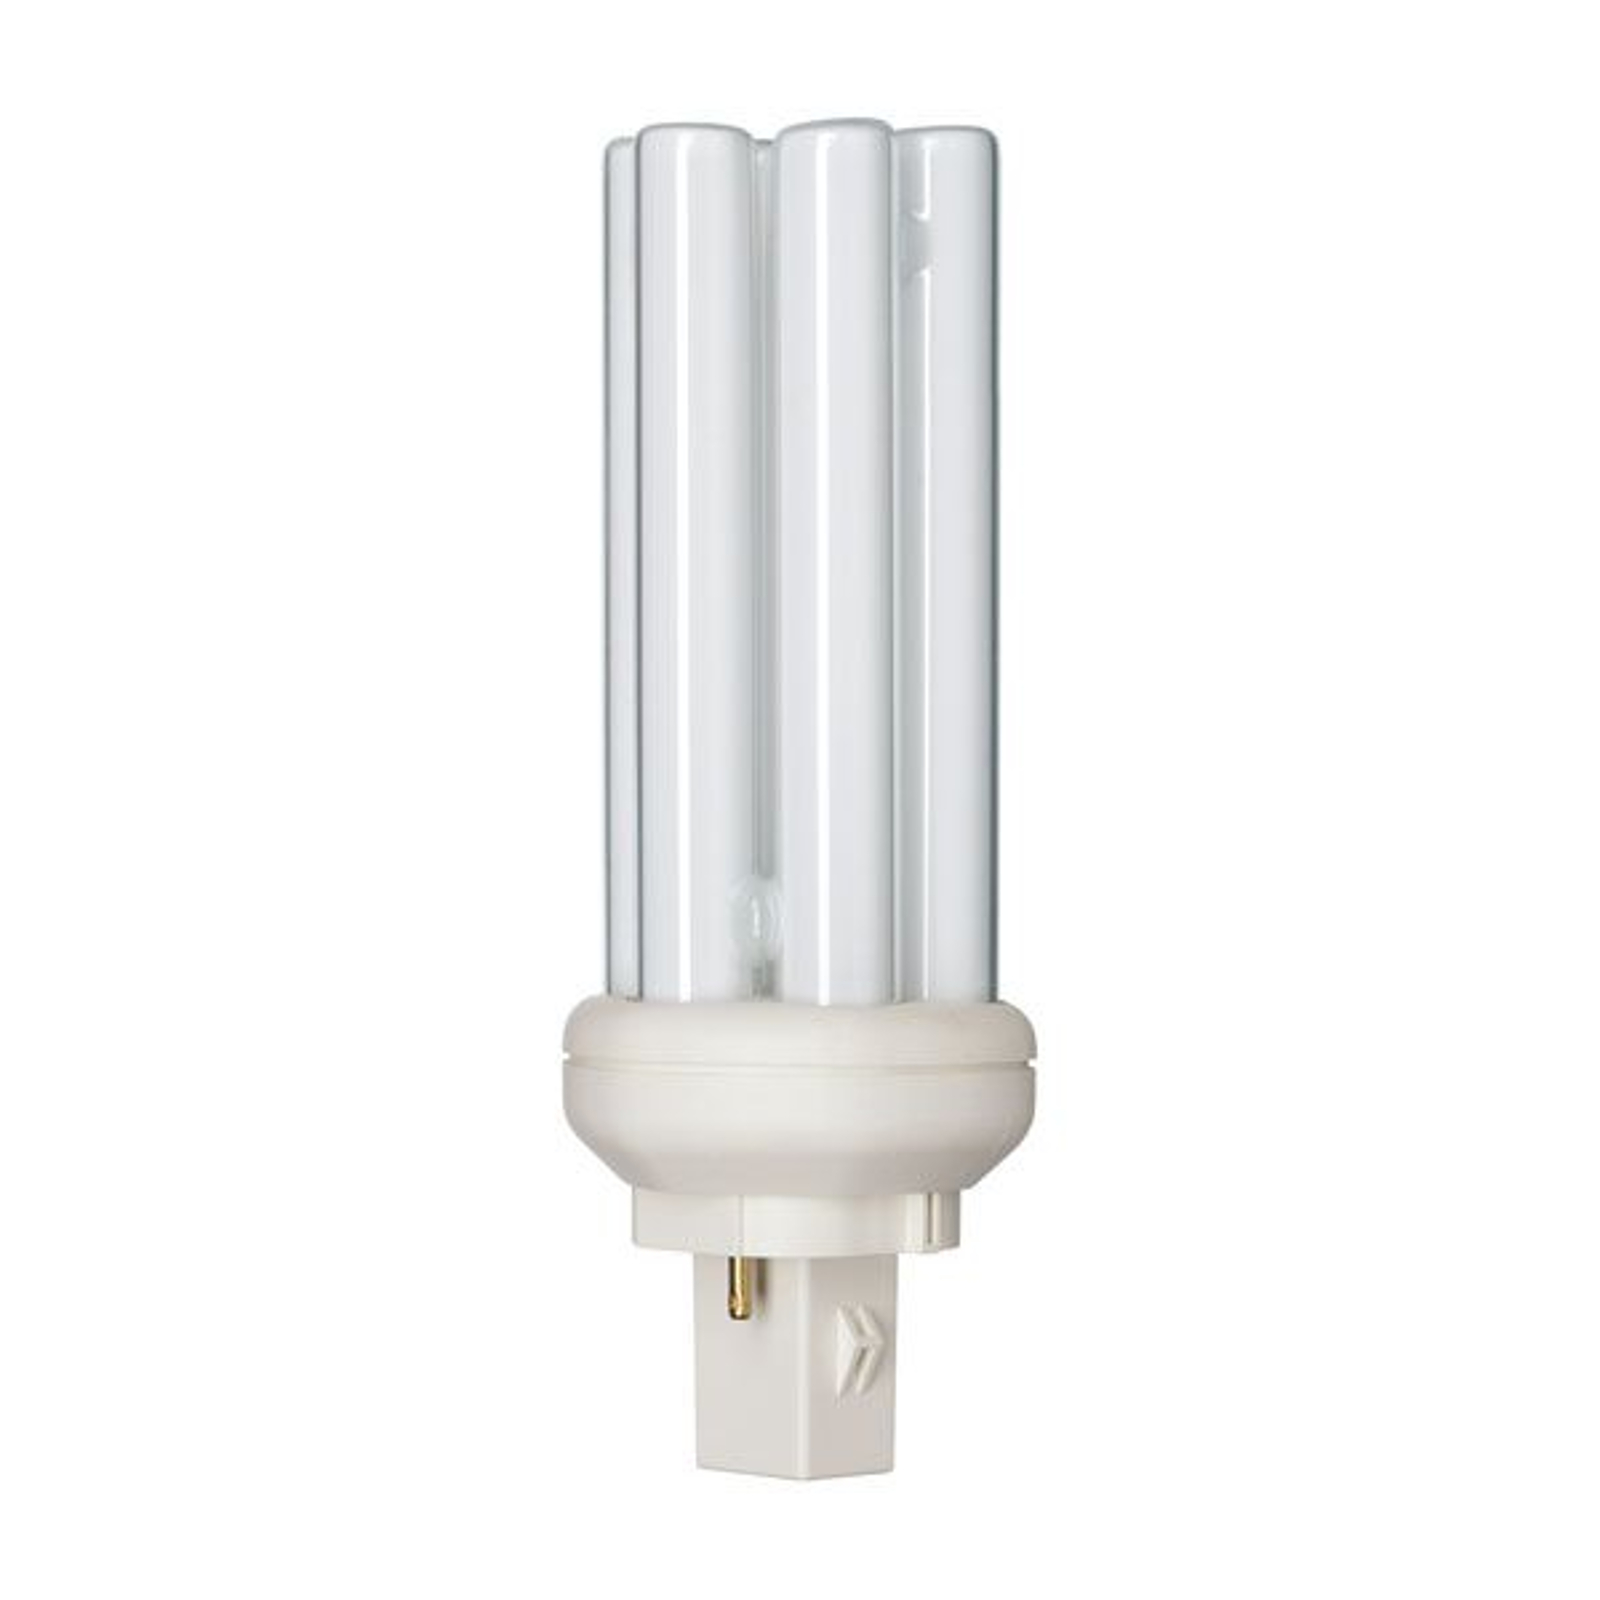 GX24d Kompaktleuchtstofflampe Master 26W PL-T 840